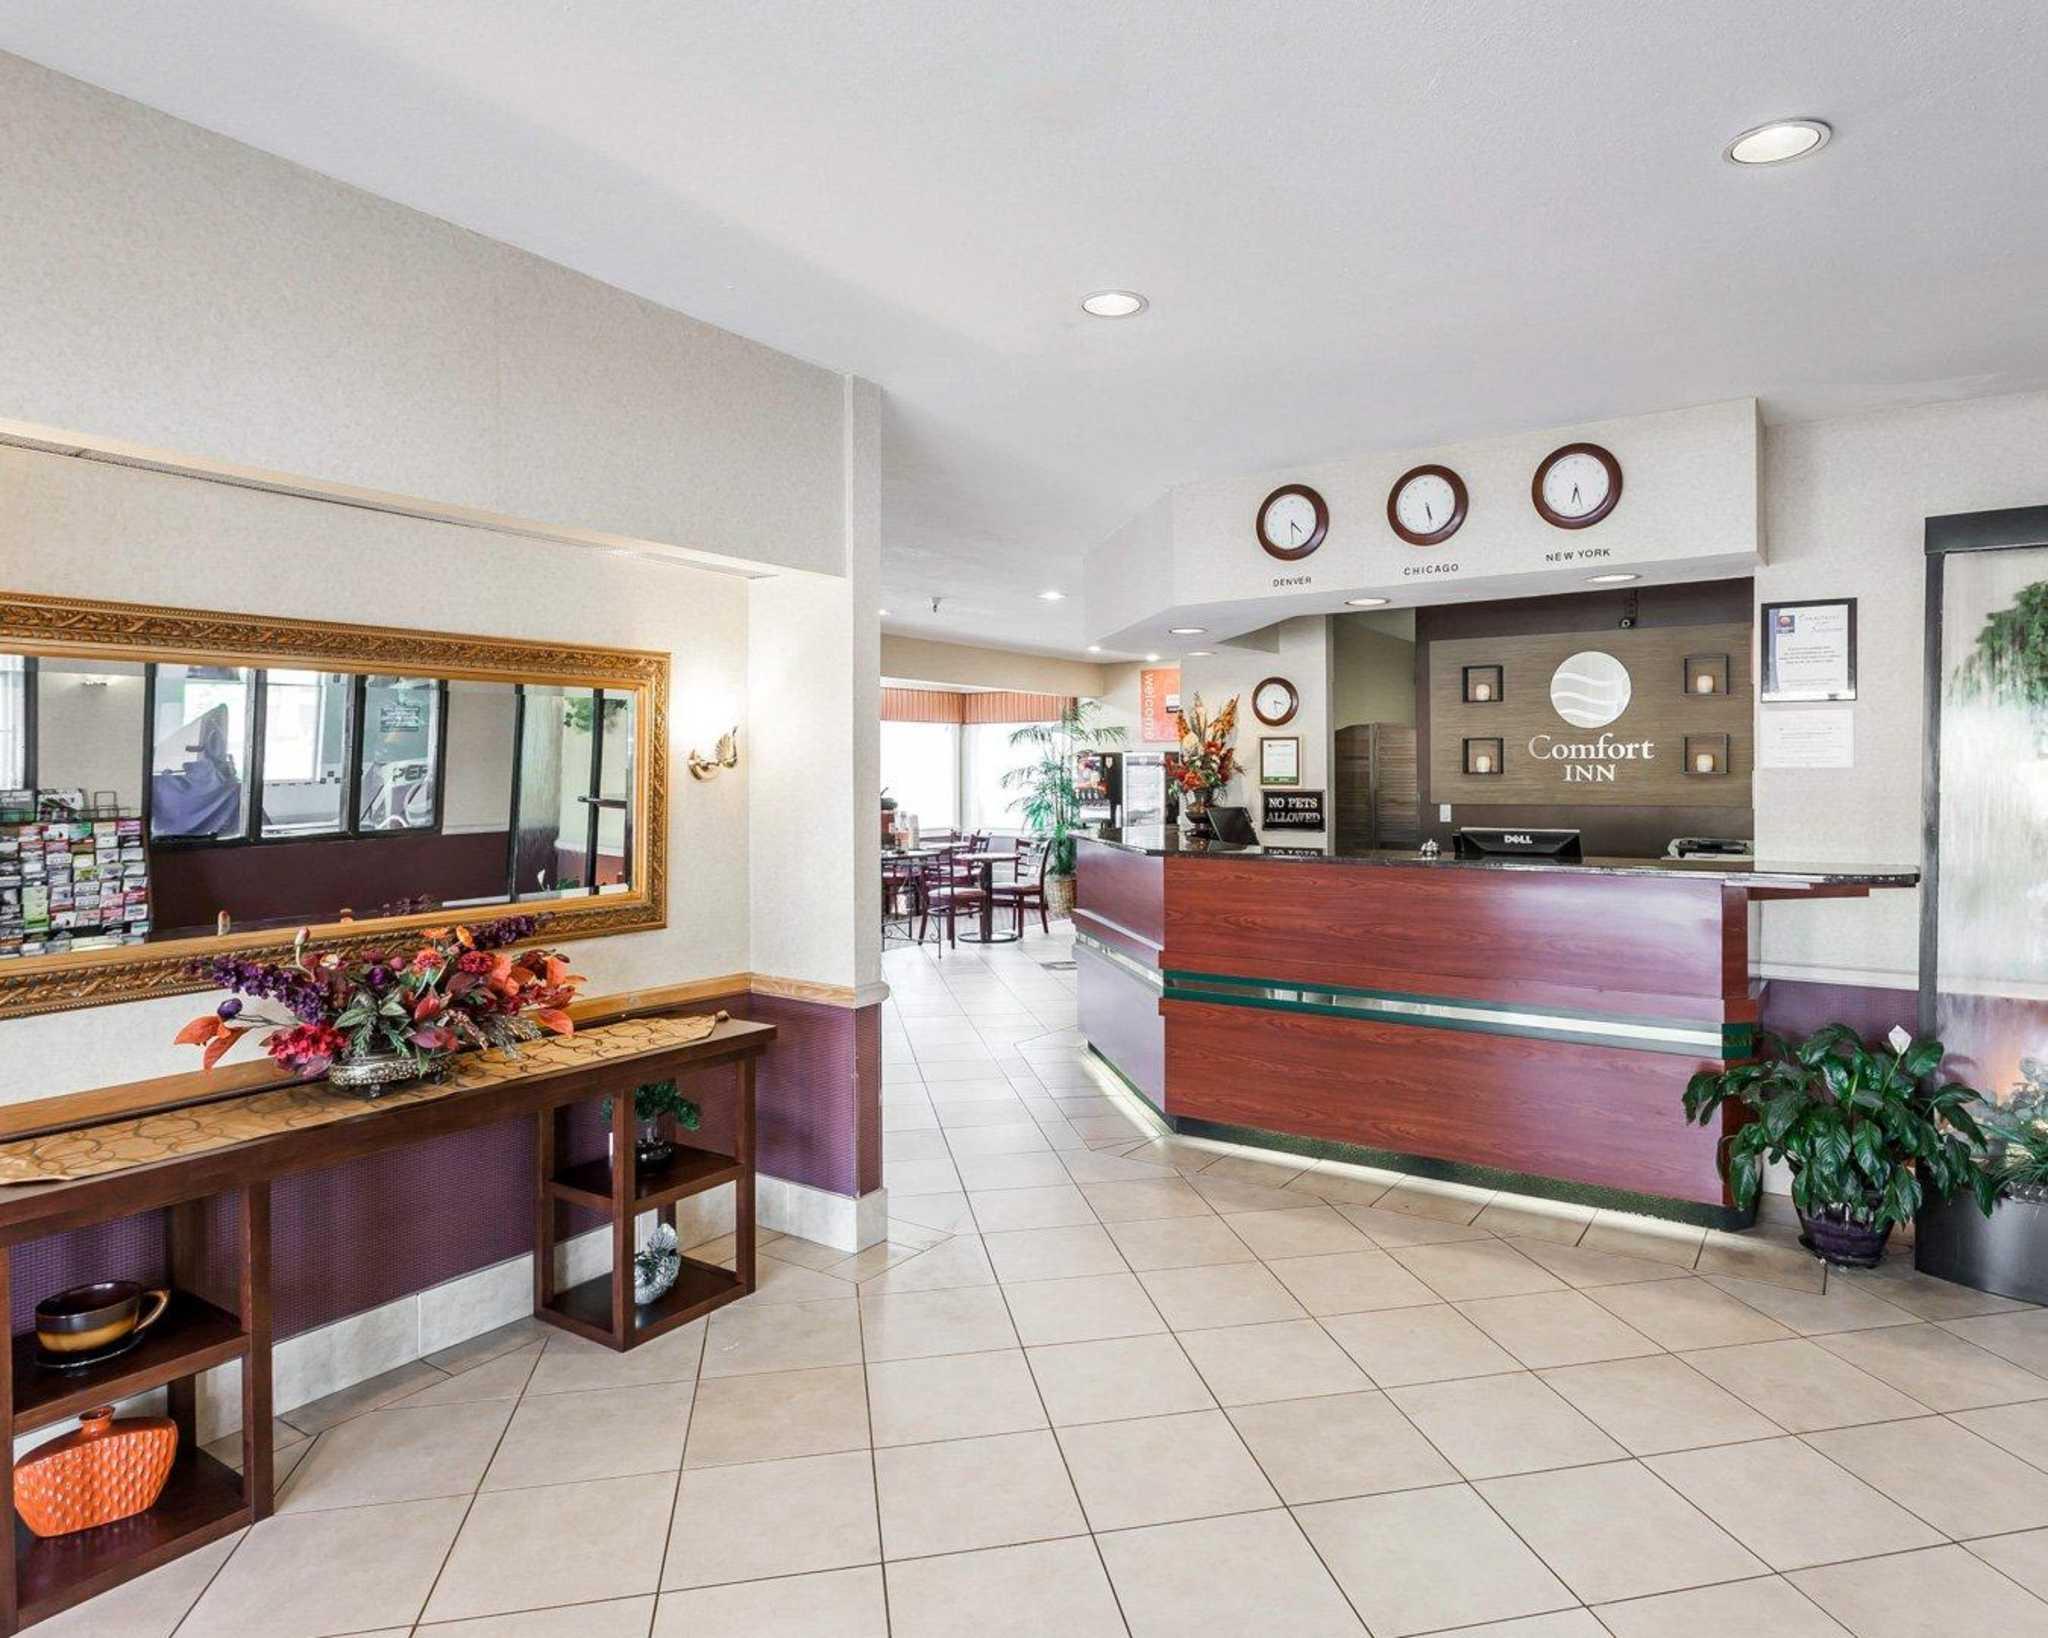 Comfort Inn Kelso - Longview image 18